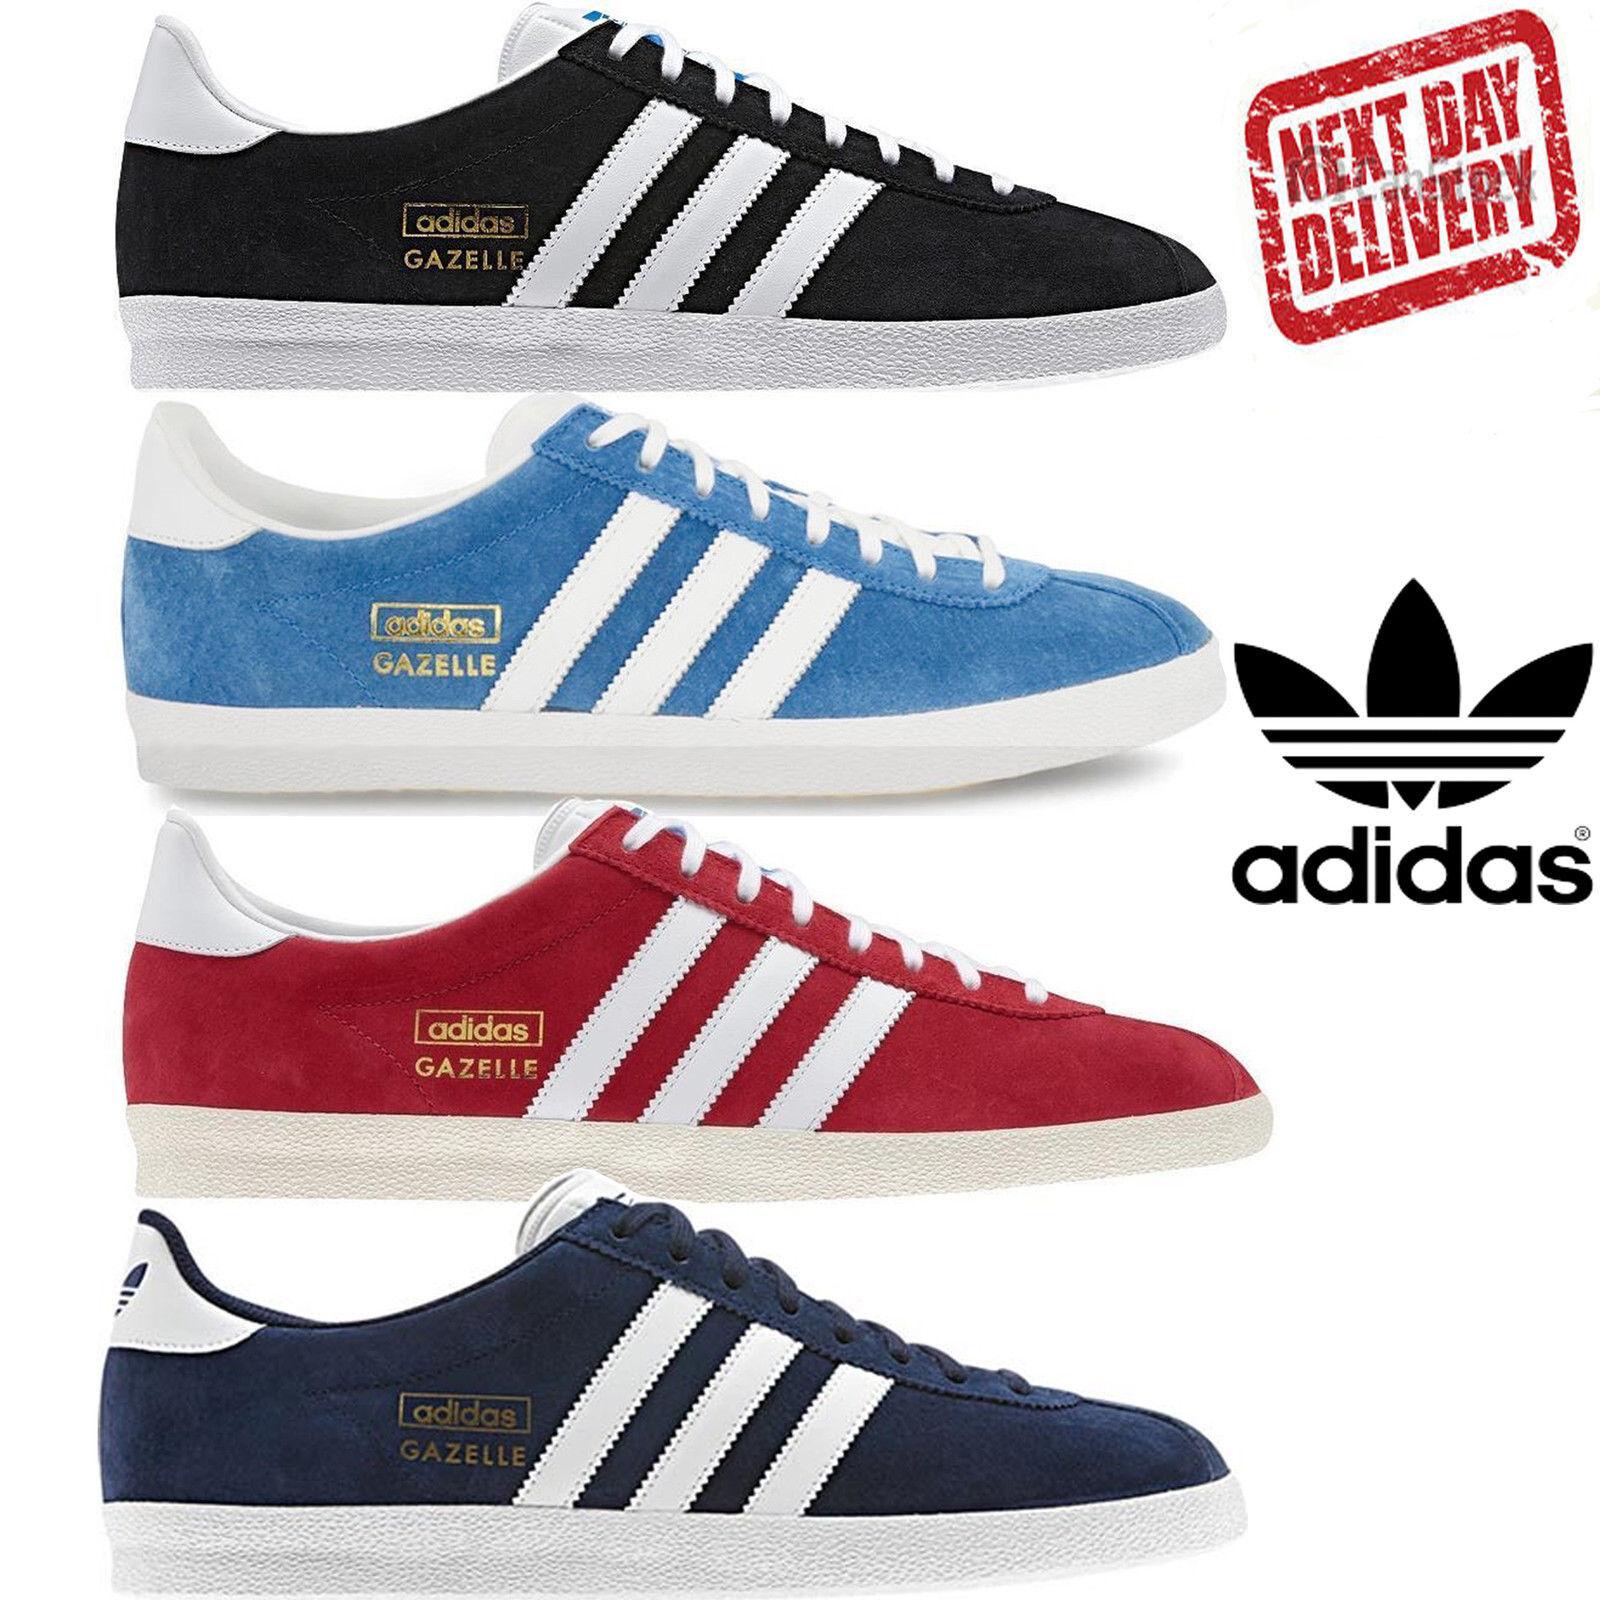 Adidas Trainers Original Gazelle Og Retro Black Blue Uk